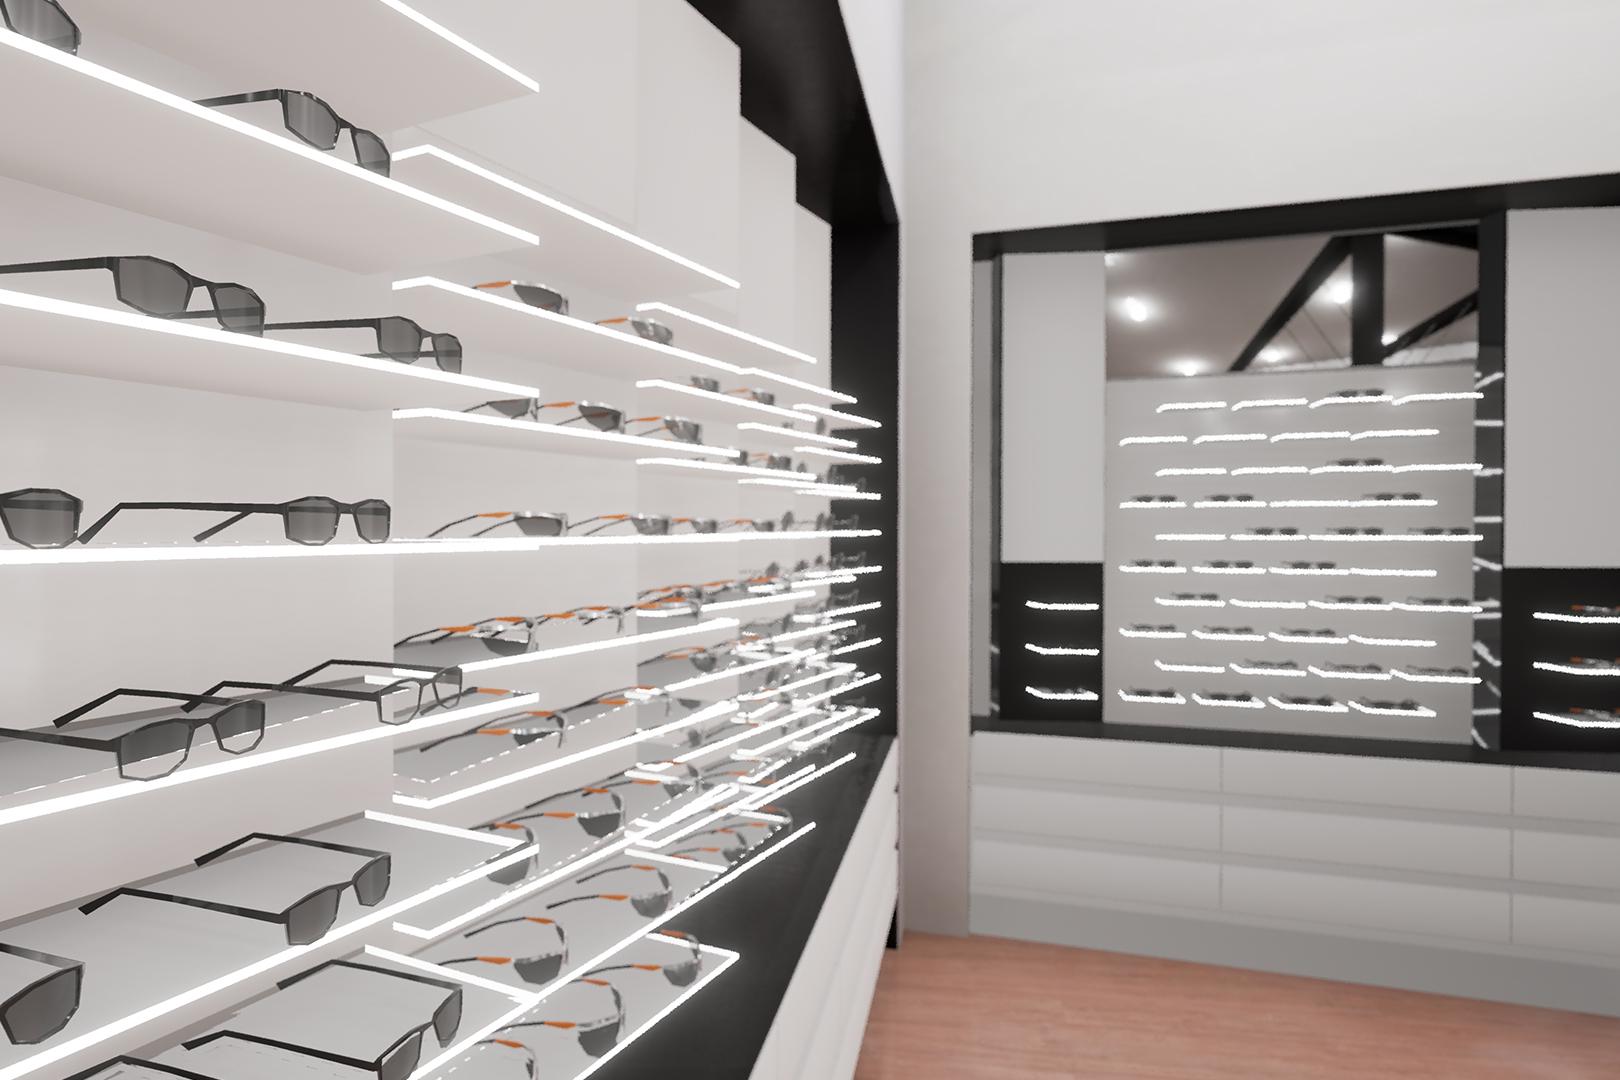 5th and sunset VR walkthrough screenshot, luxury sunglass display